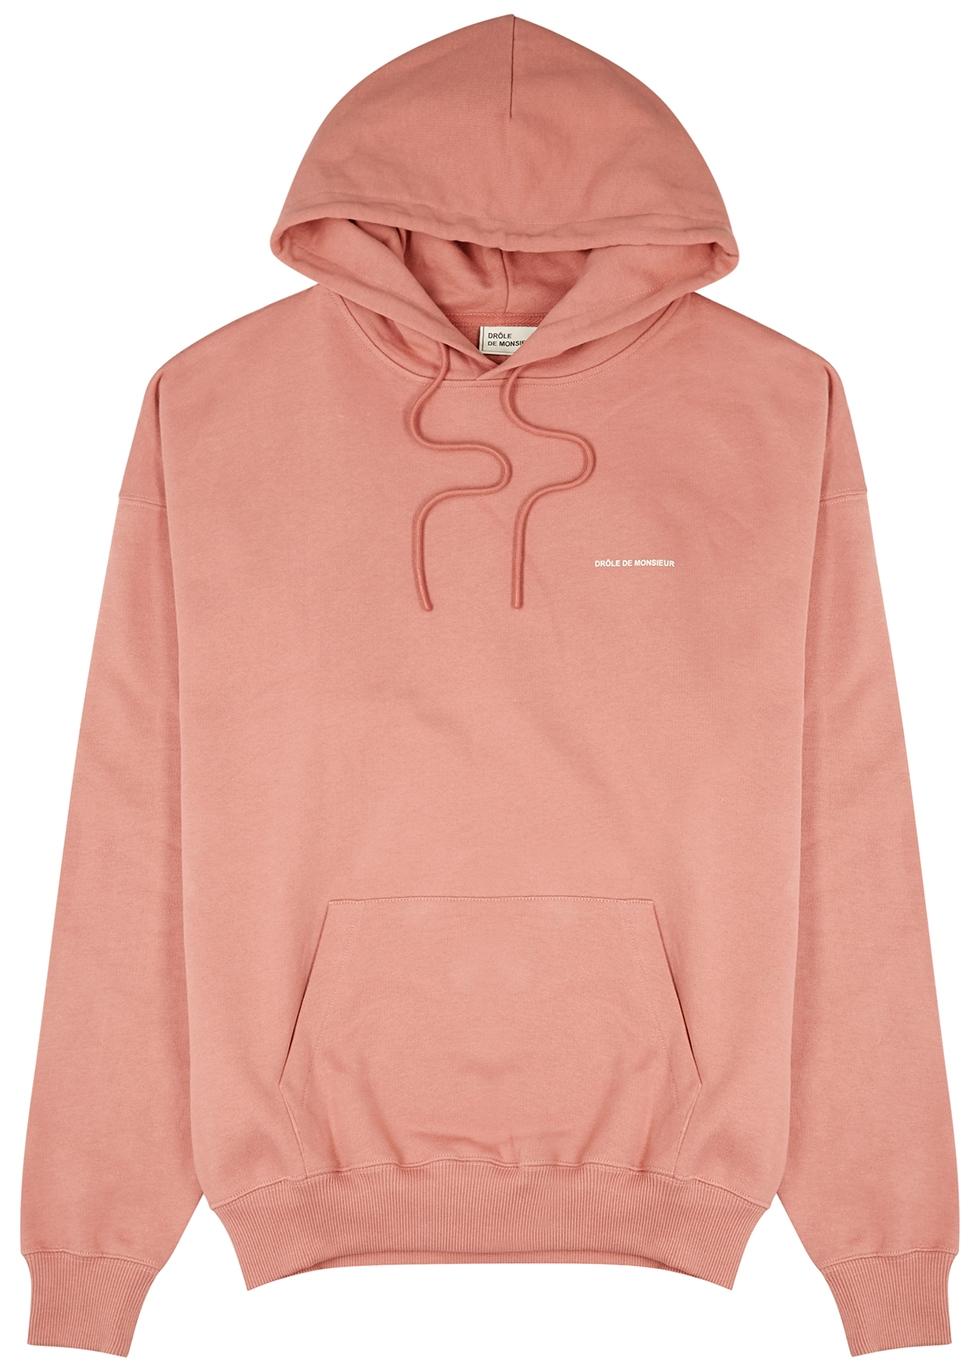 NFPM rose hooded cotton sweatshirt